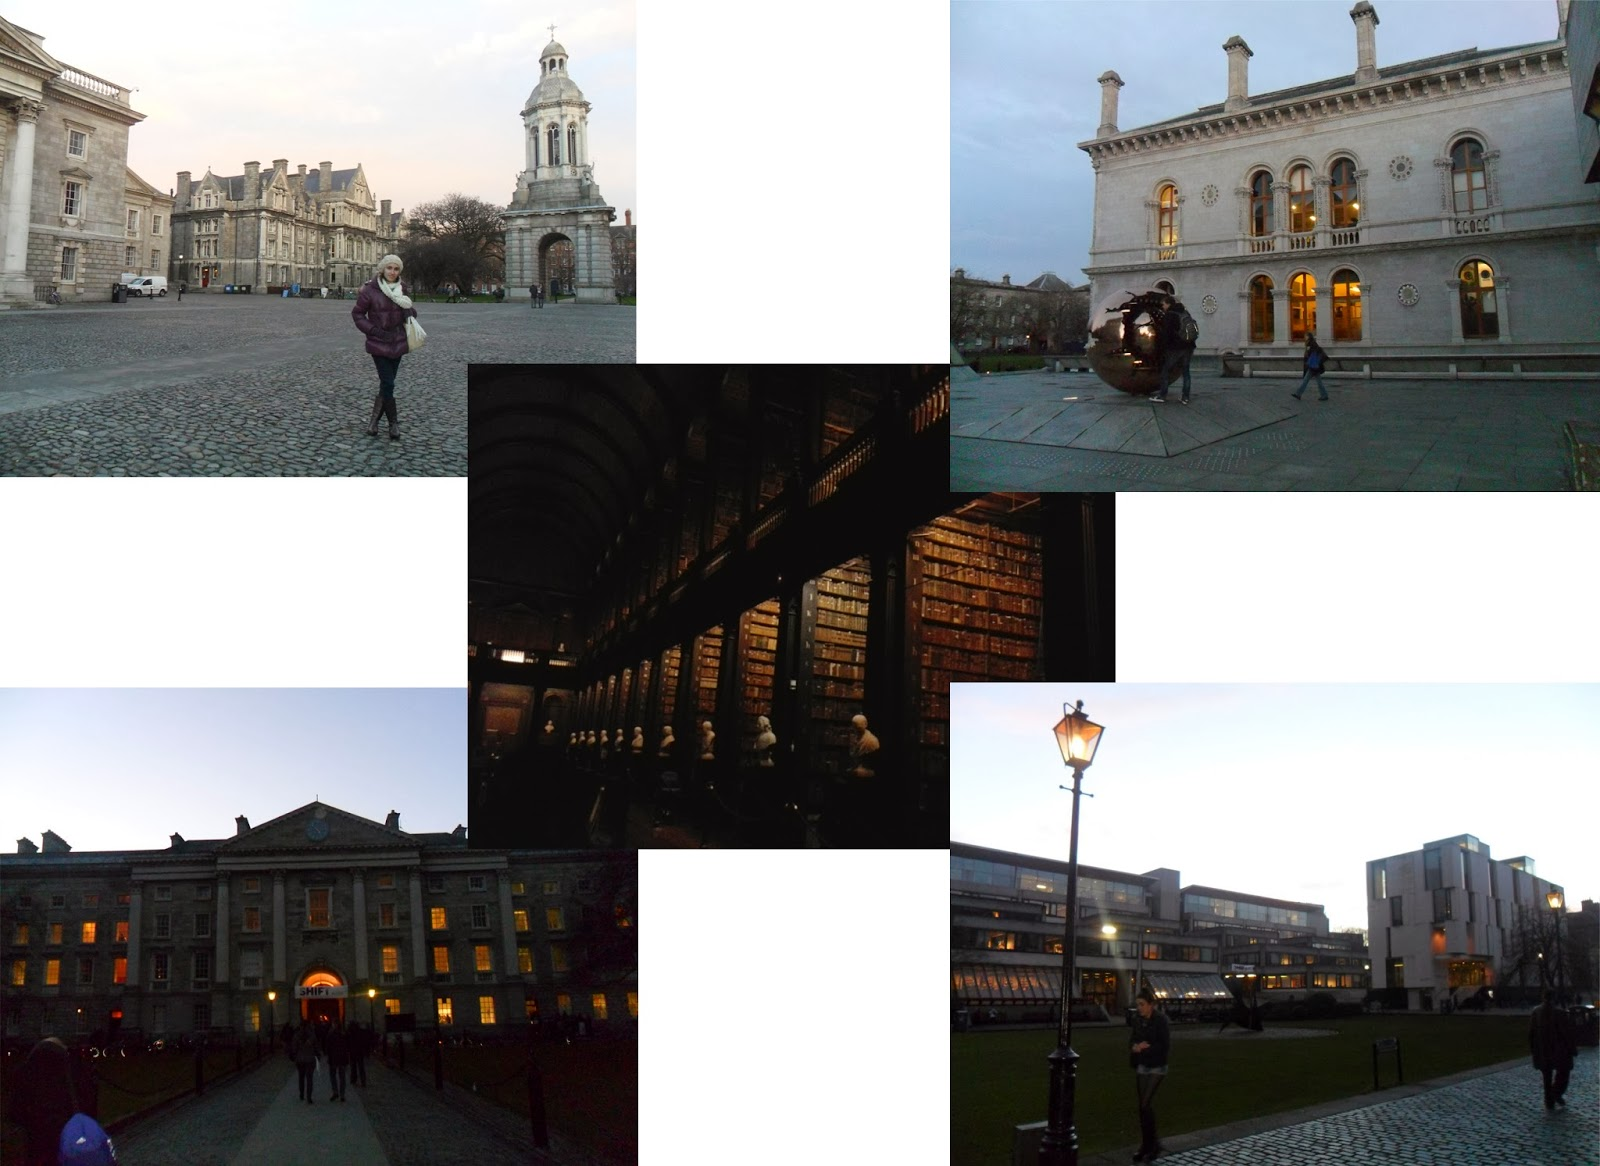 Trinity College, Dublín, Irlanda, Ireland